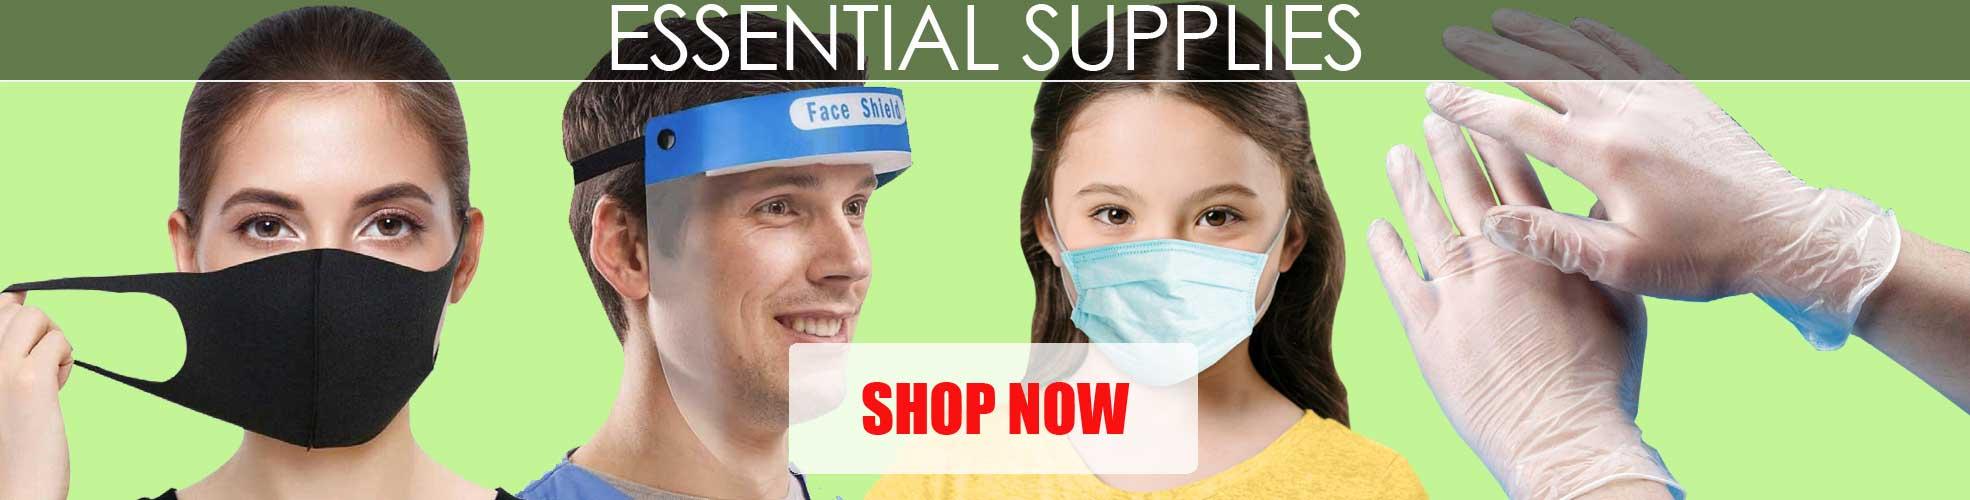 Wholesale Travel Supplies, Essential Personal Hygiene, Antibacterial Soap, Hand Wash, Hand Cream, Gel Insoles